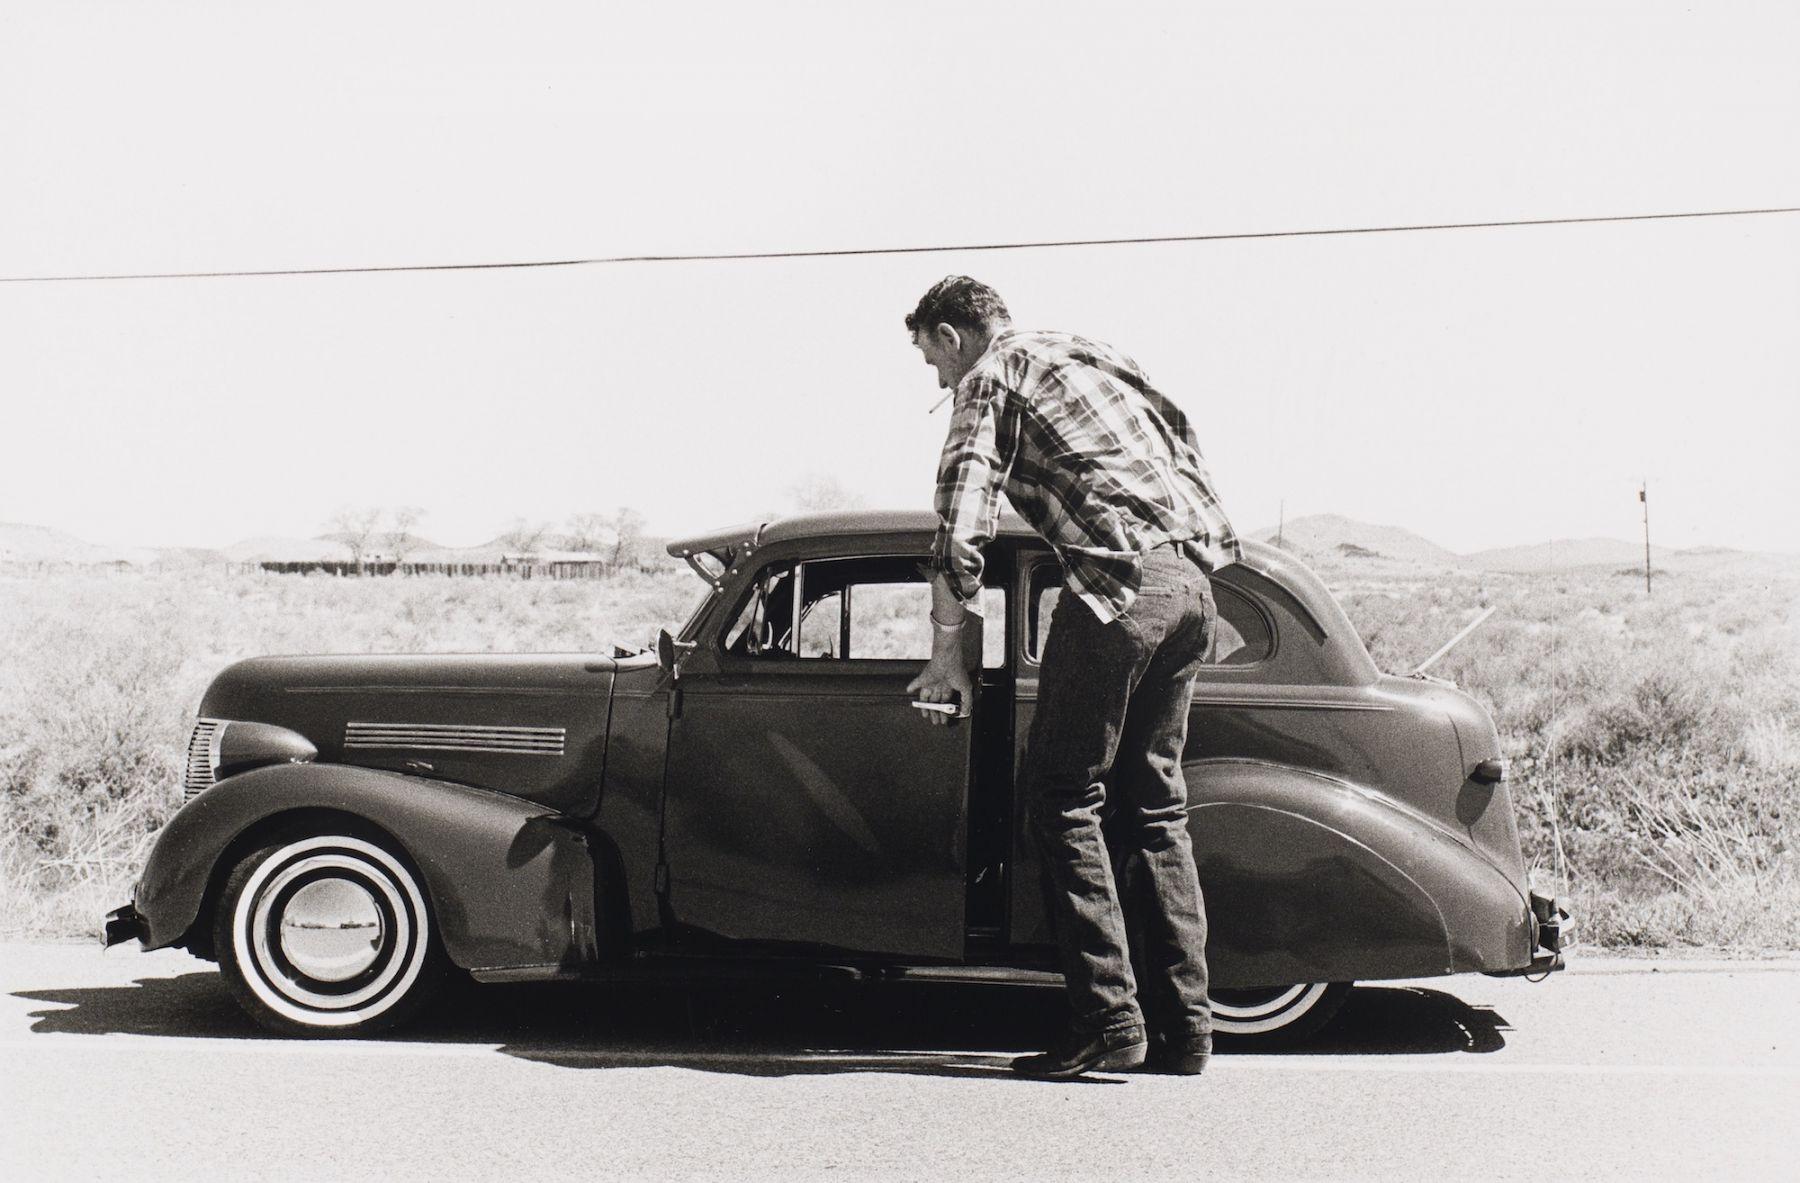 Philippe Salaun (1943-)  Rencontre dans le Desert, Arizona, 1995  Gelatin silver print  12 x 16 inches (paper), black and white photography